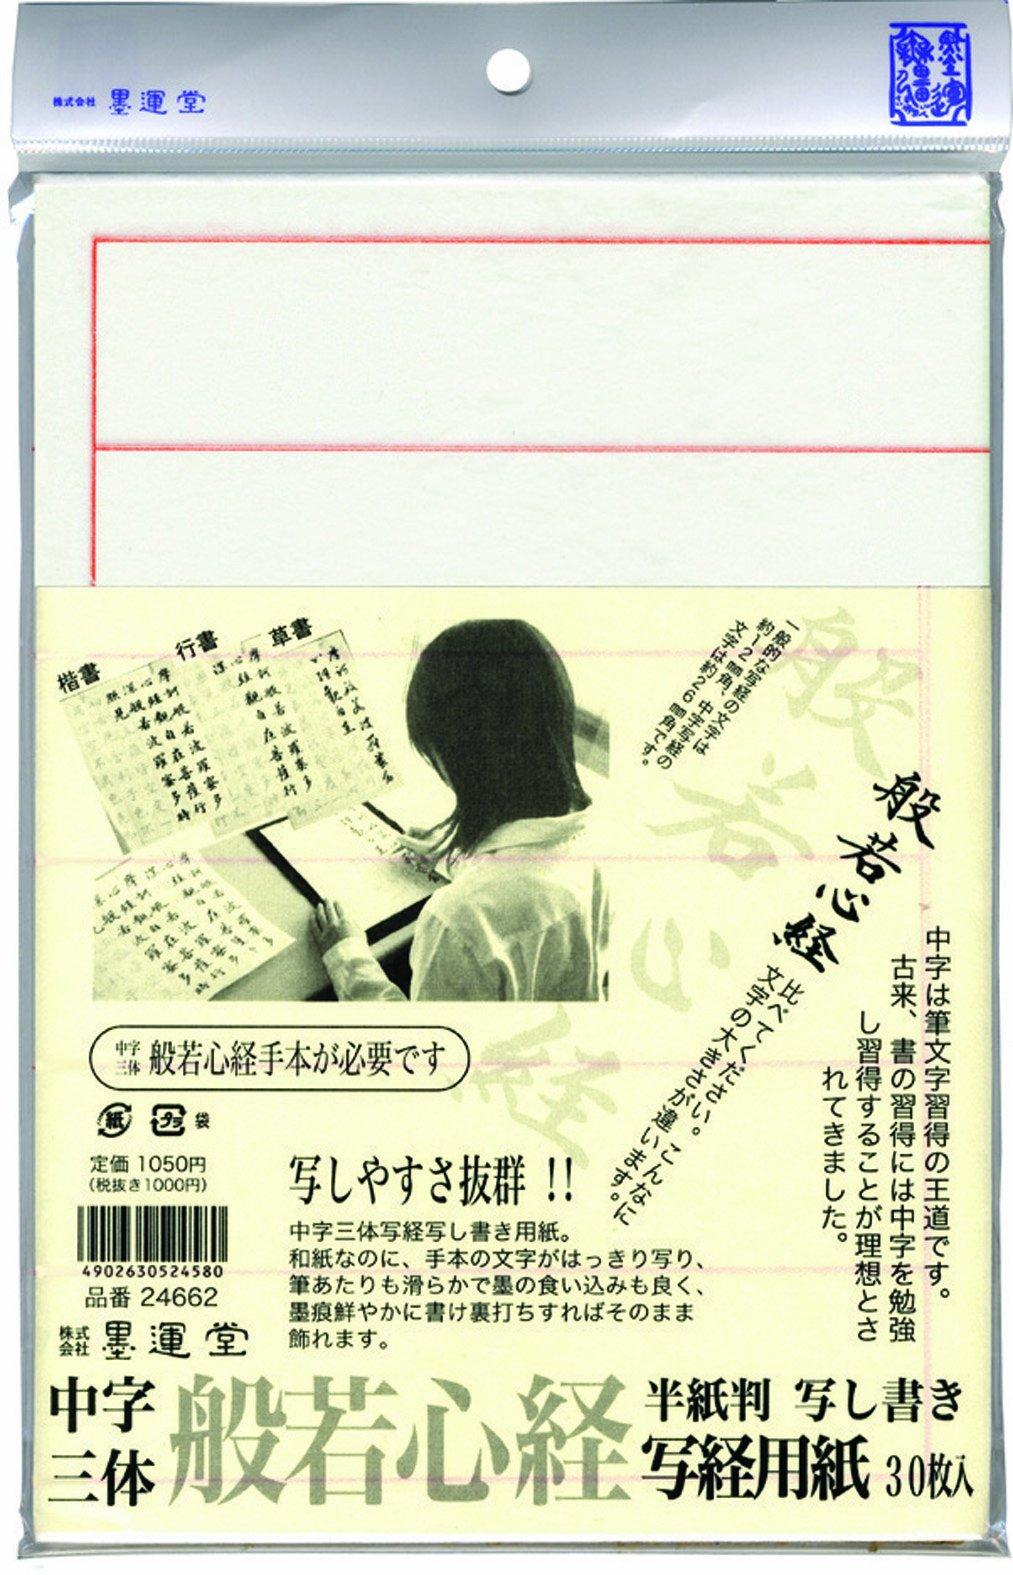 Mua 墨運堂 写経用紙 中字写経用紙 30枚入 半紙判 24662 Tren Amazon